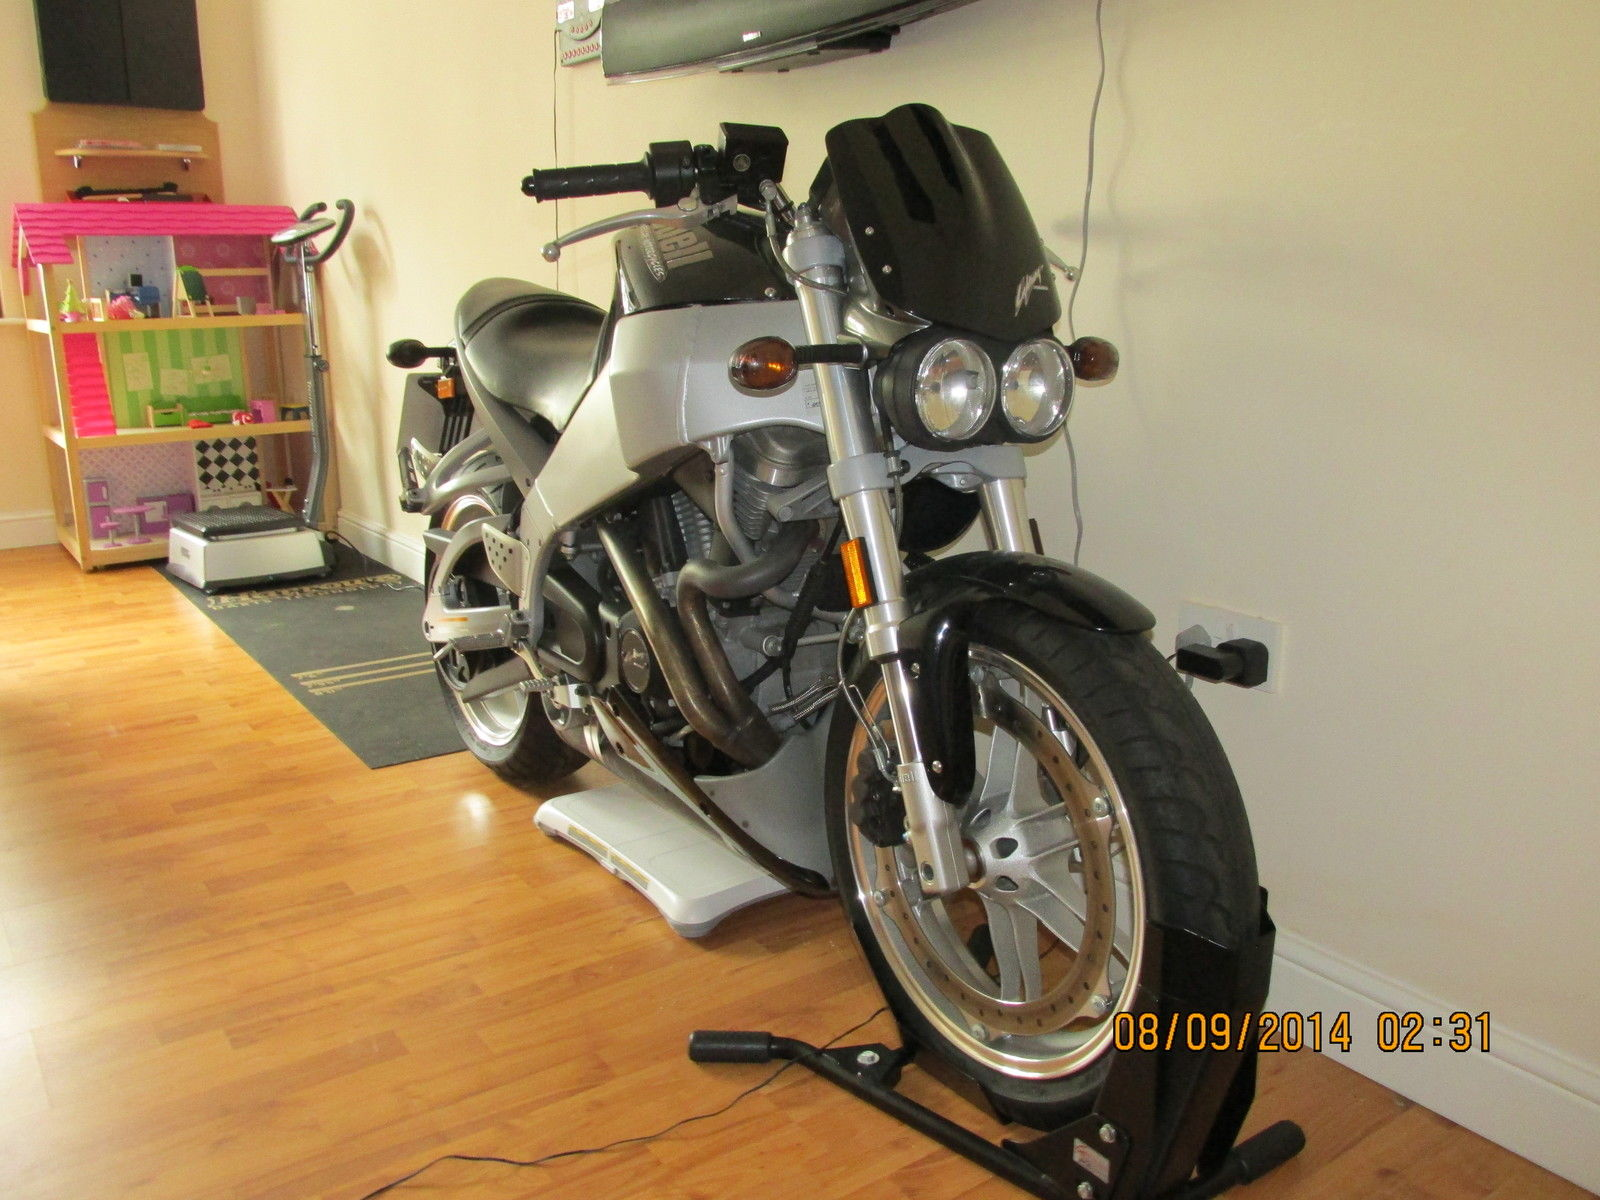 Buell XB9SX custom | Voitures et motos, Motos, Voiture